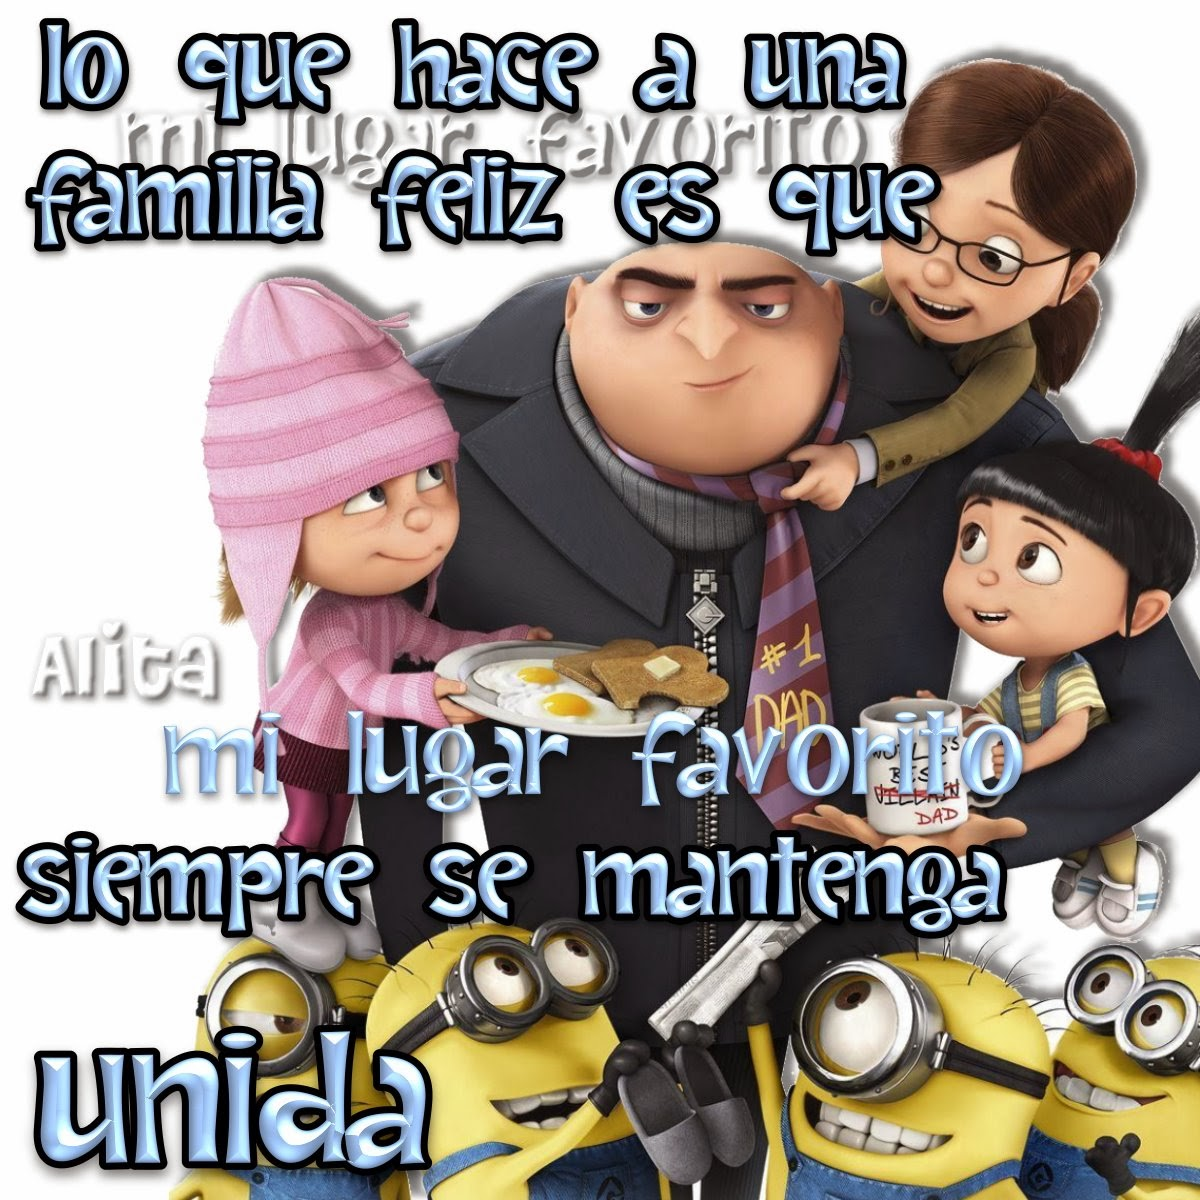 https://www.facebook.com/milugarfavoritoAlita